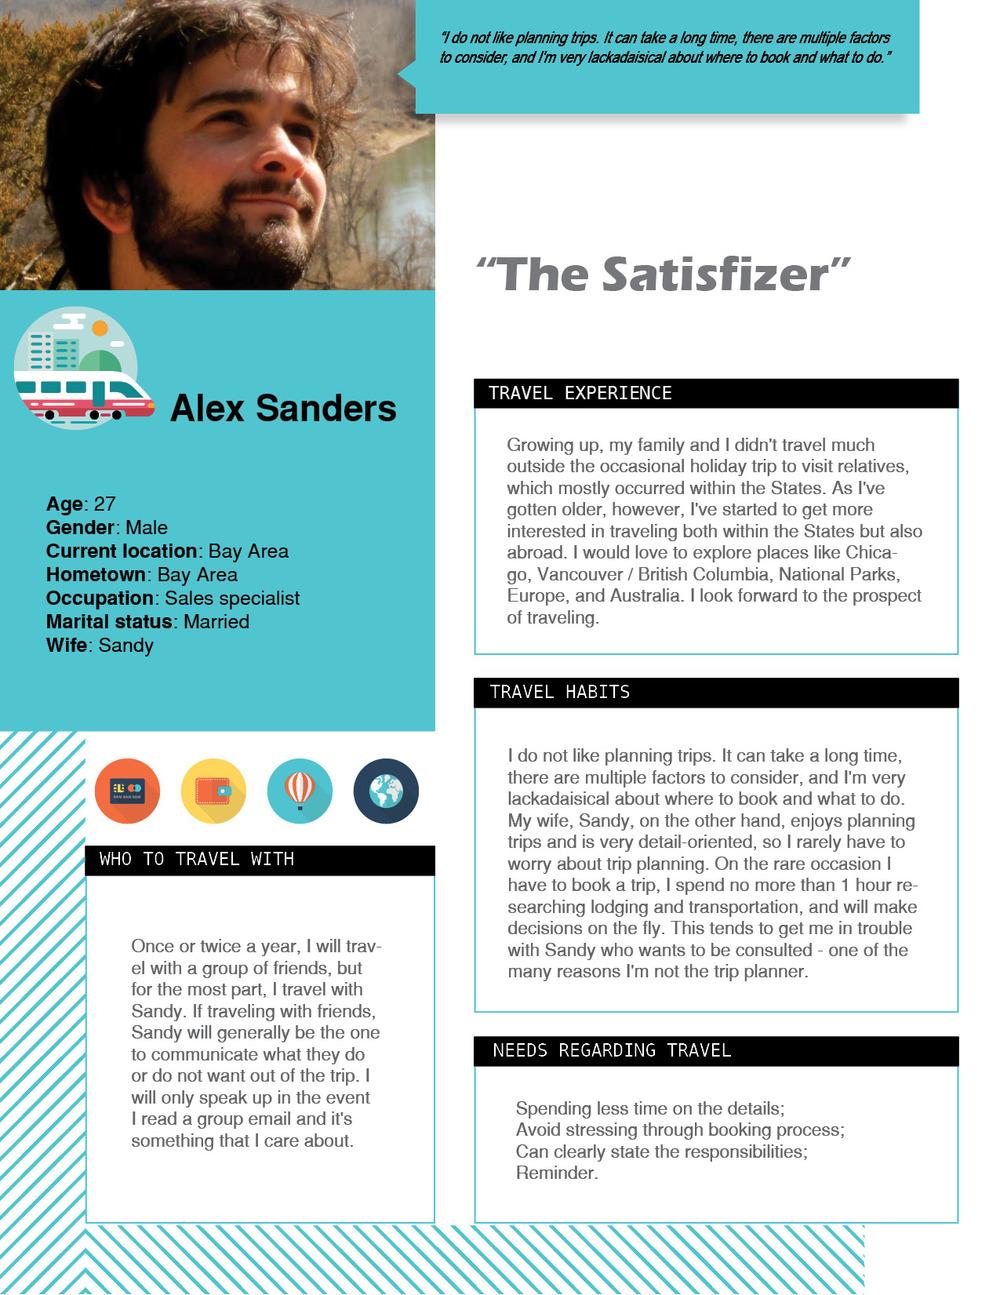 Image 1 - Persona, Alex Sanders